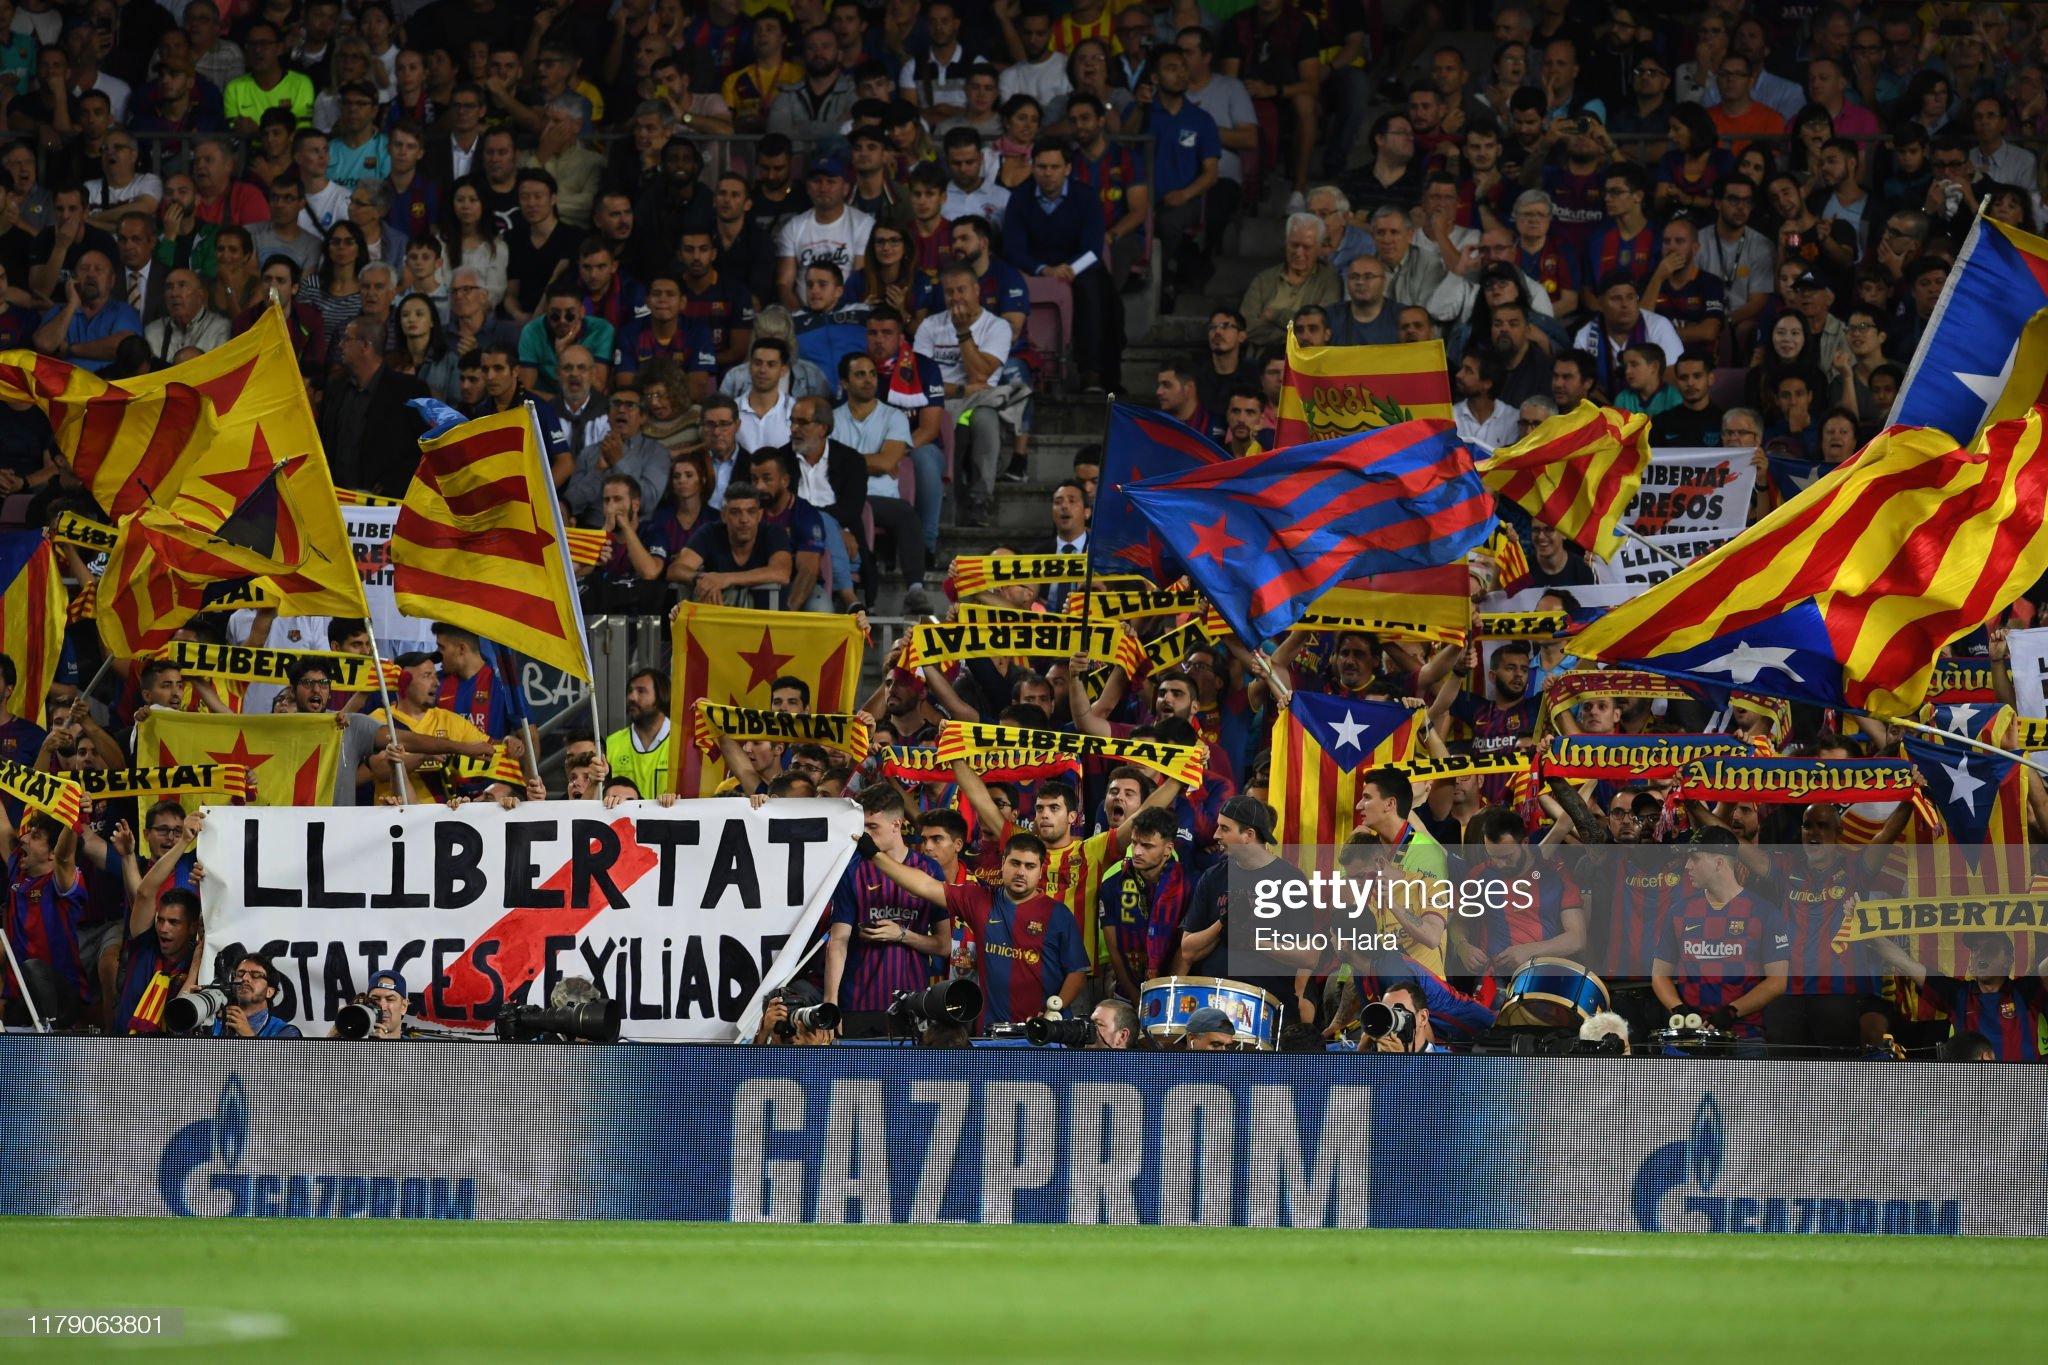 صور مباراة : برشلونة - إنتر 2-1 ( 02-10-2019 )  Fans-of-fc-barcelona-cheer-during-the-uefa-champions-league-group-f-picture-id1179063801?s=2048x2048